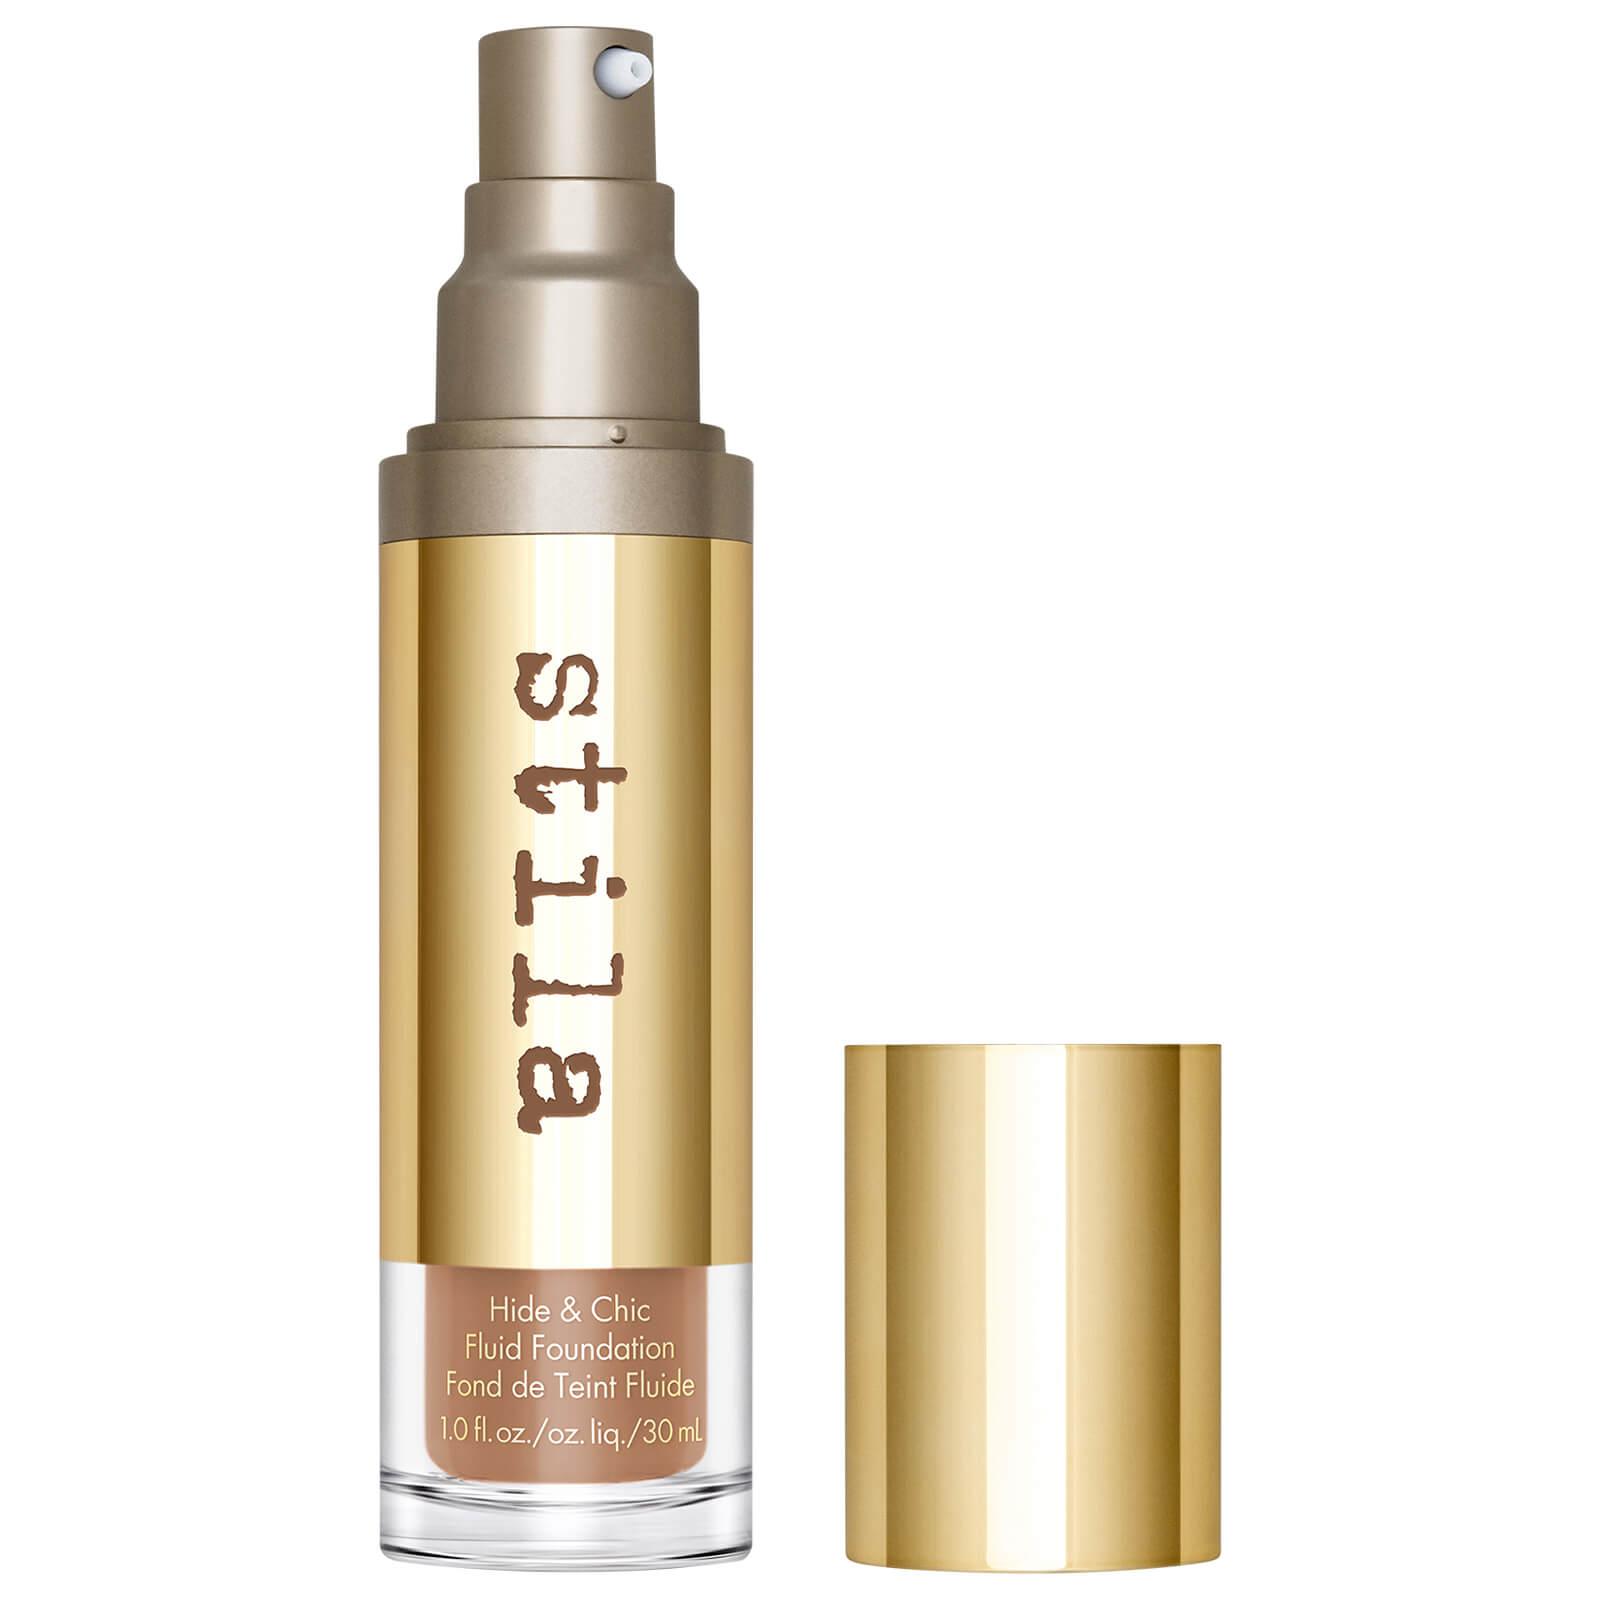 Купить Stila Hide and Chic Fluid Foundation 30ml (Various Shades) - Tan 5